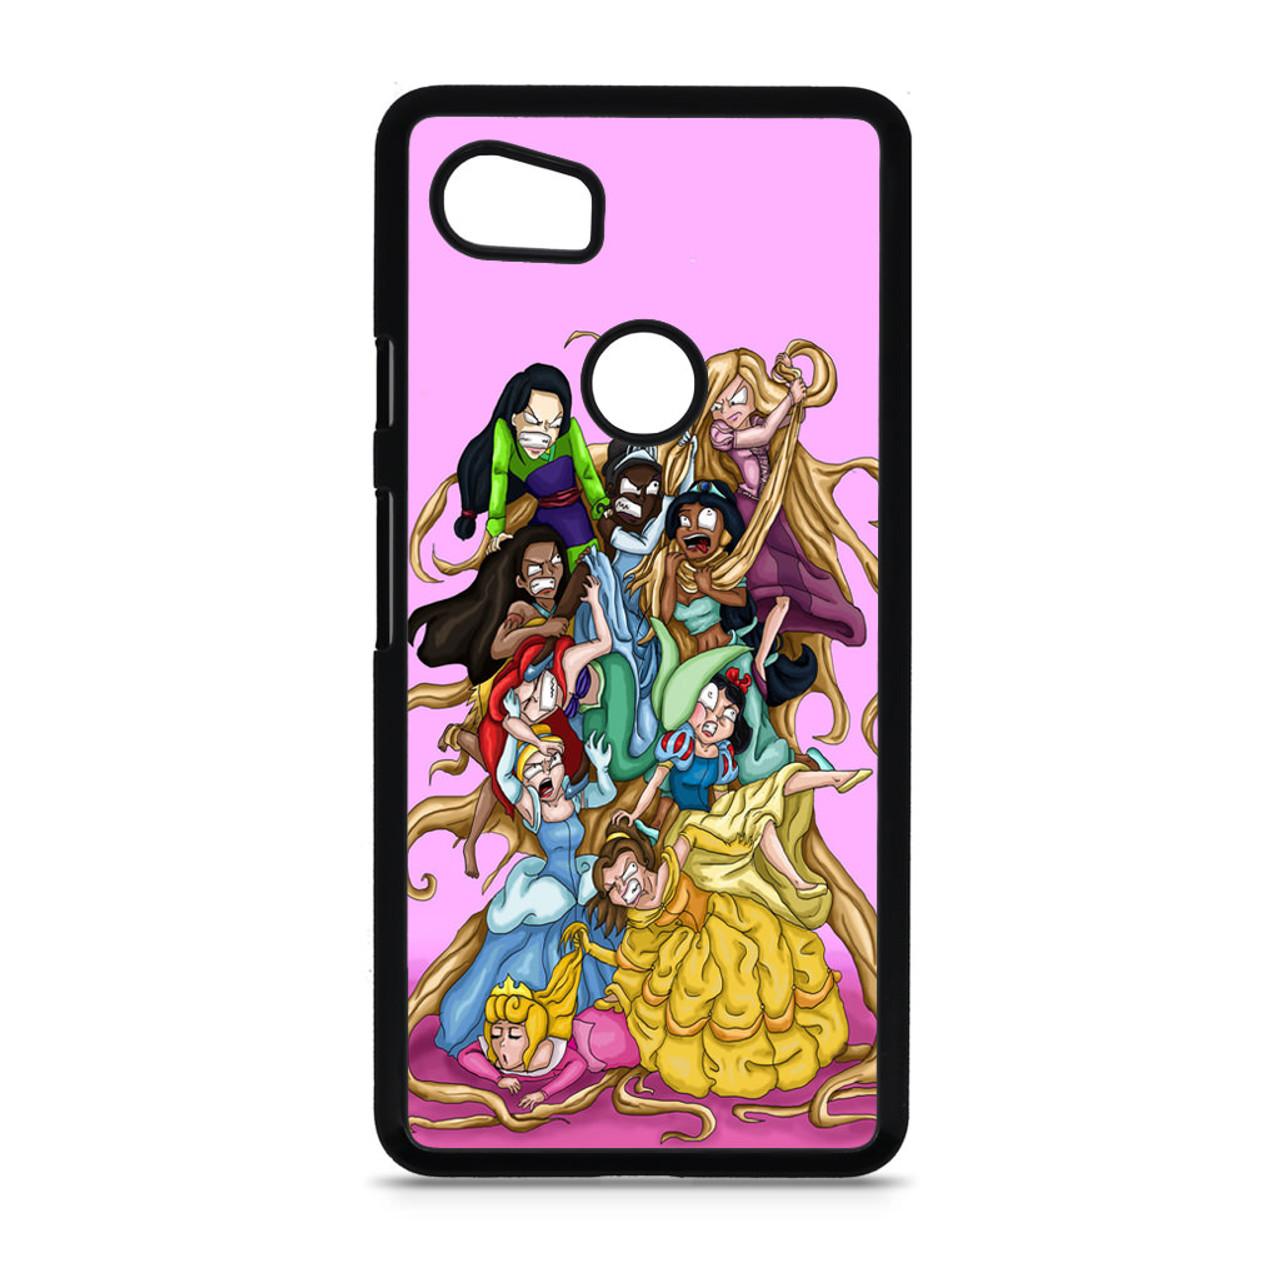 on sale c2940 13969 Disney Princess Beast Face Google Pixel 2 XL Case